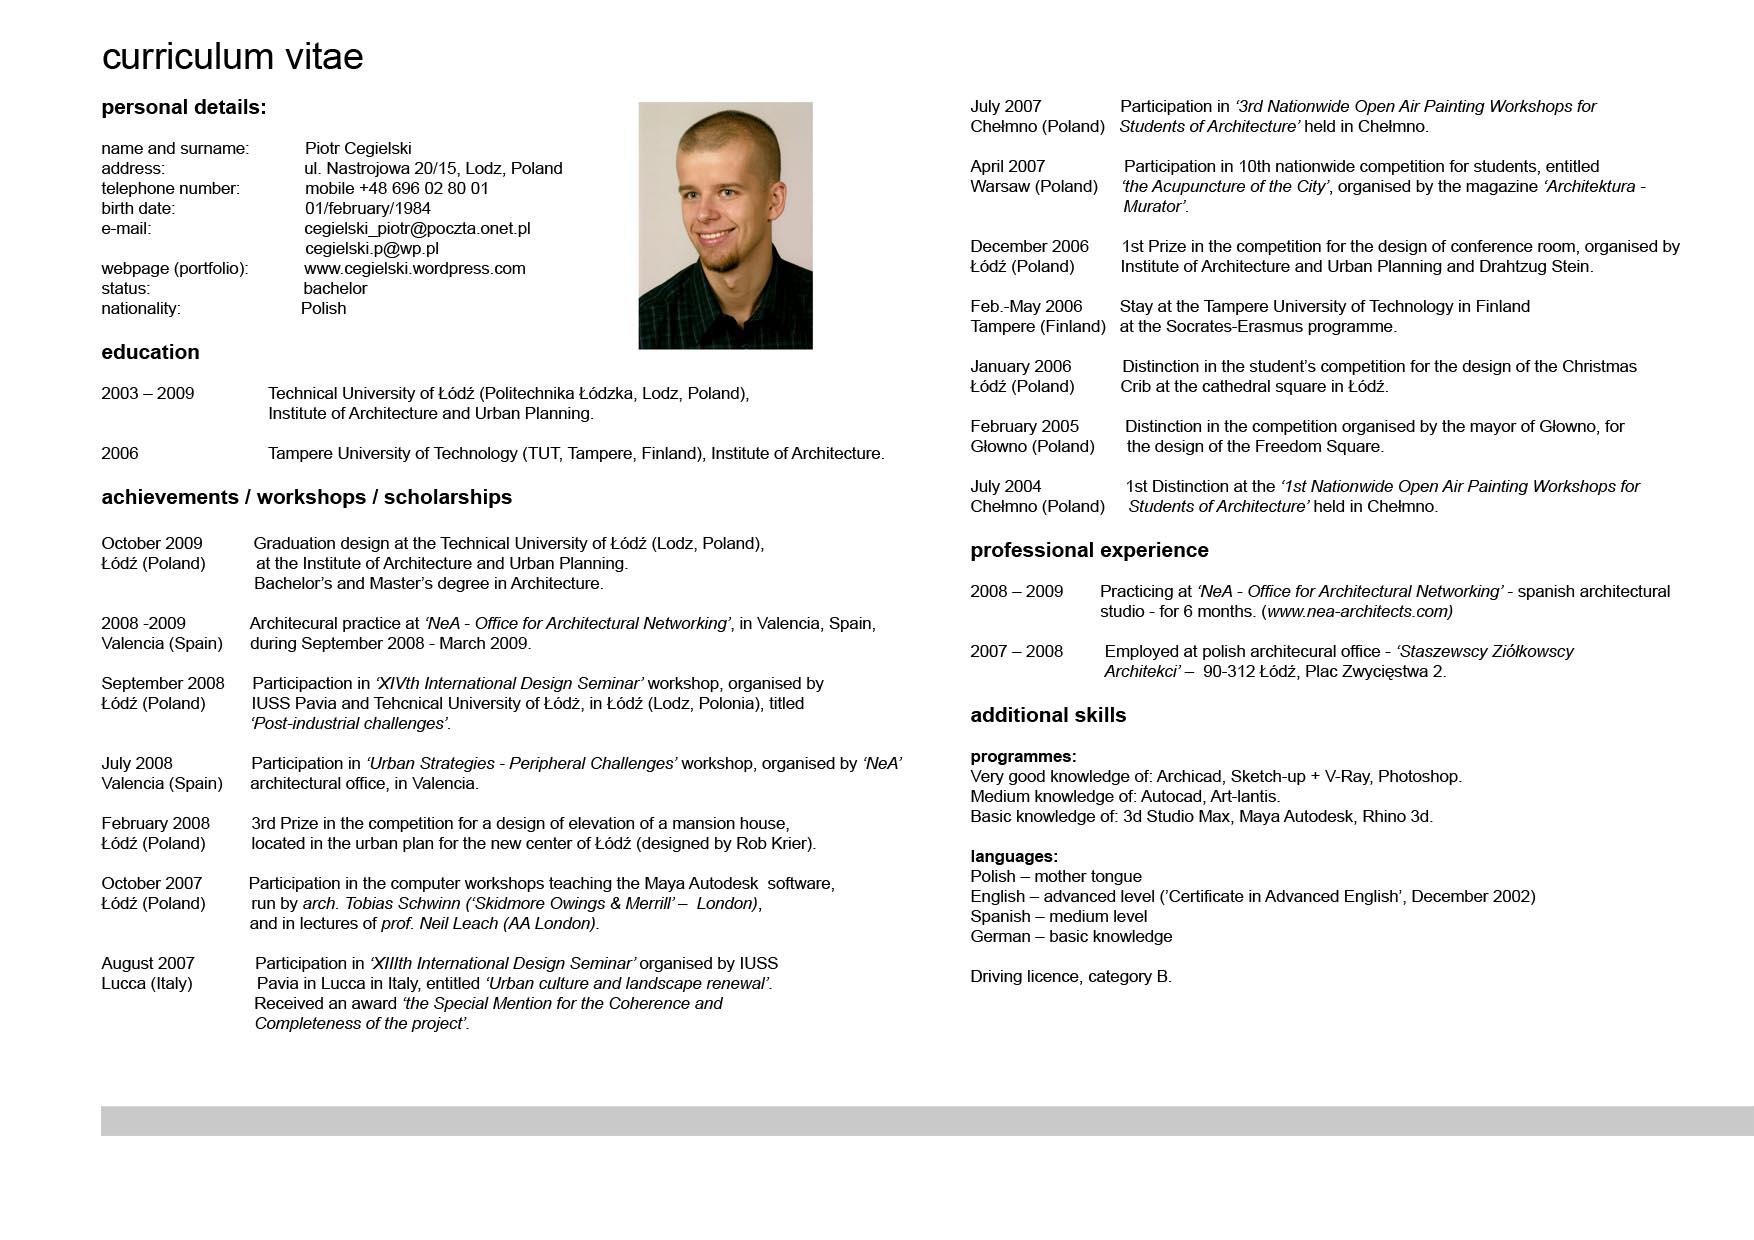 Moderno Curriculum Vitae Desarrollador Indio Java Viñeta - Ejemplo ...